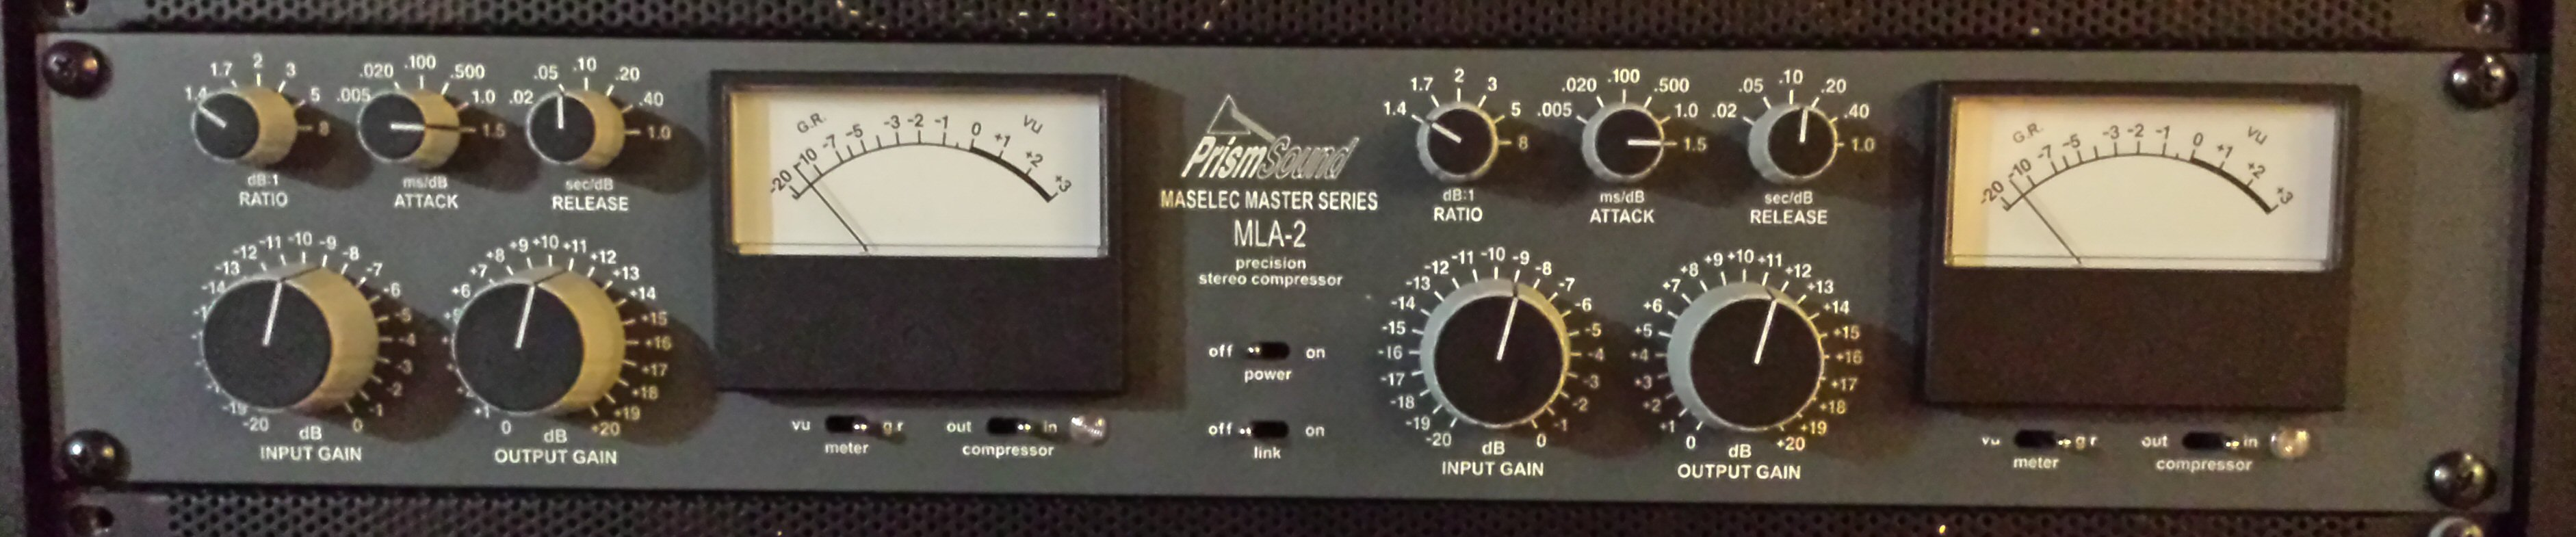 Prism Sound Maselec MLA-2 Mastering Compressor